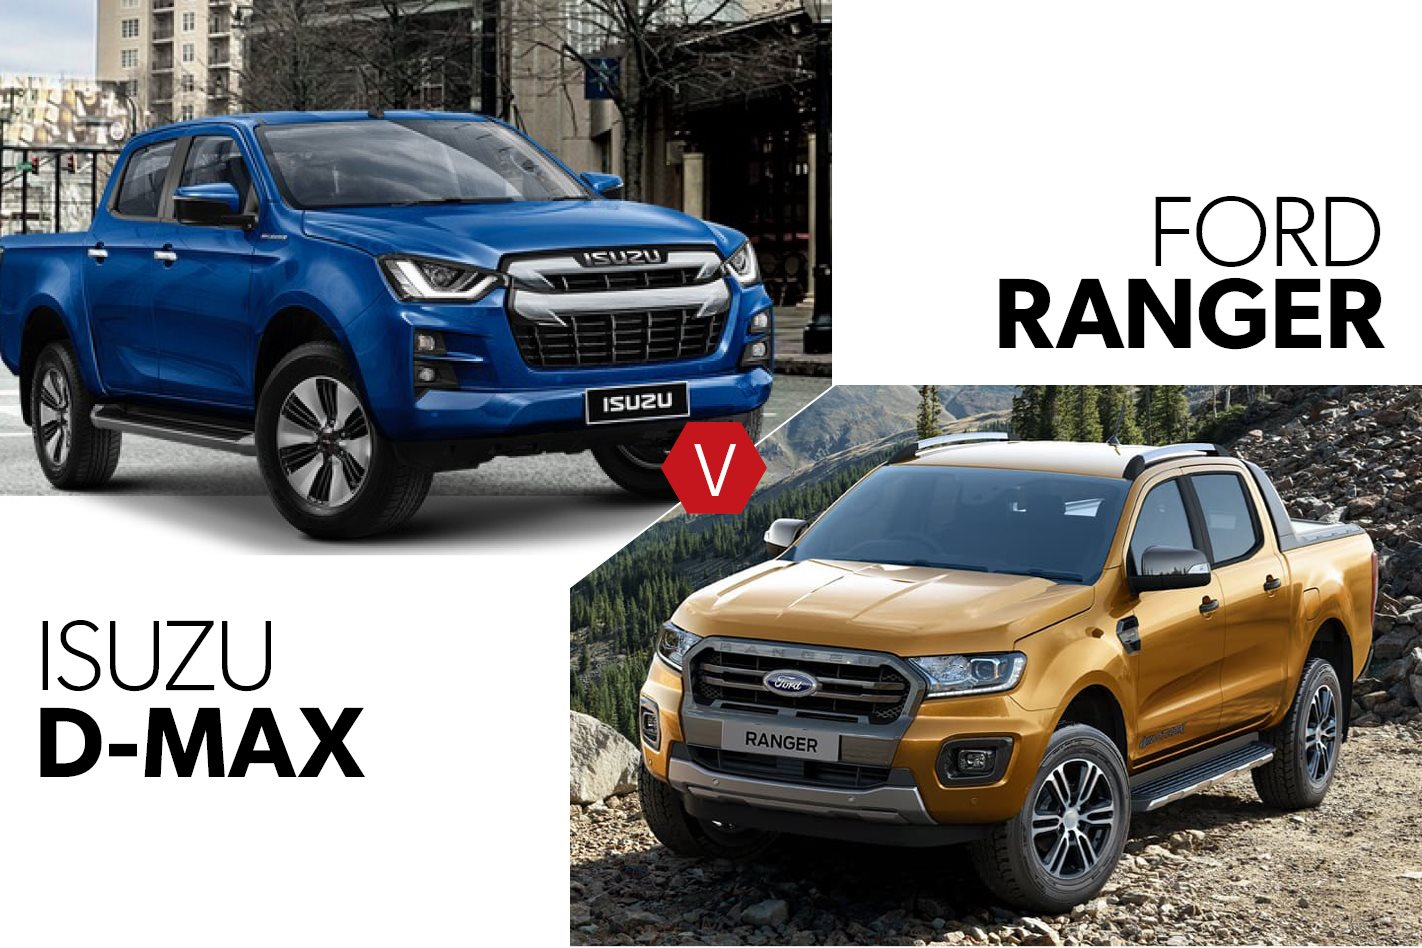 2020 Isuzu D-Max vs 2020 Ford Ranger on paper